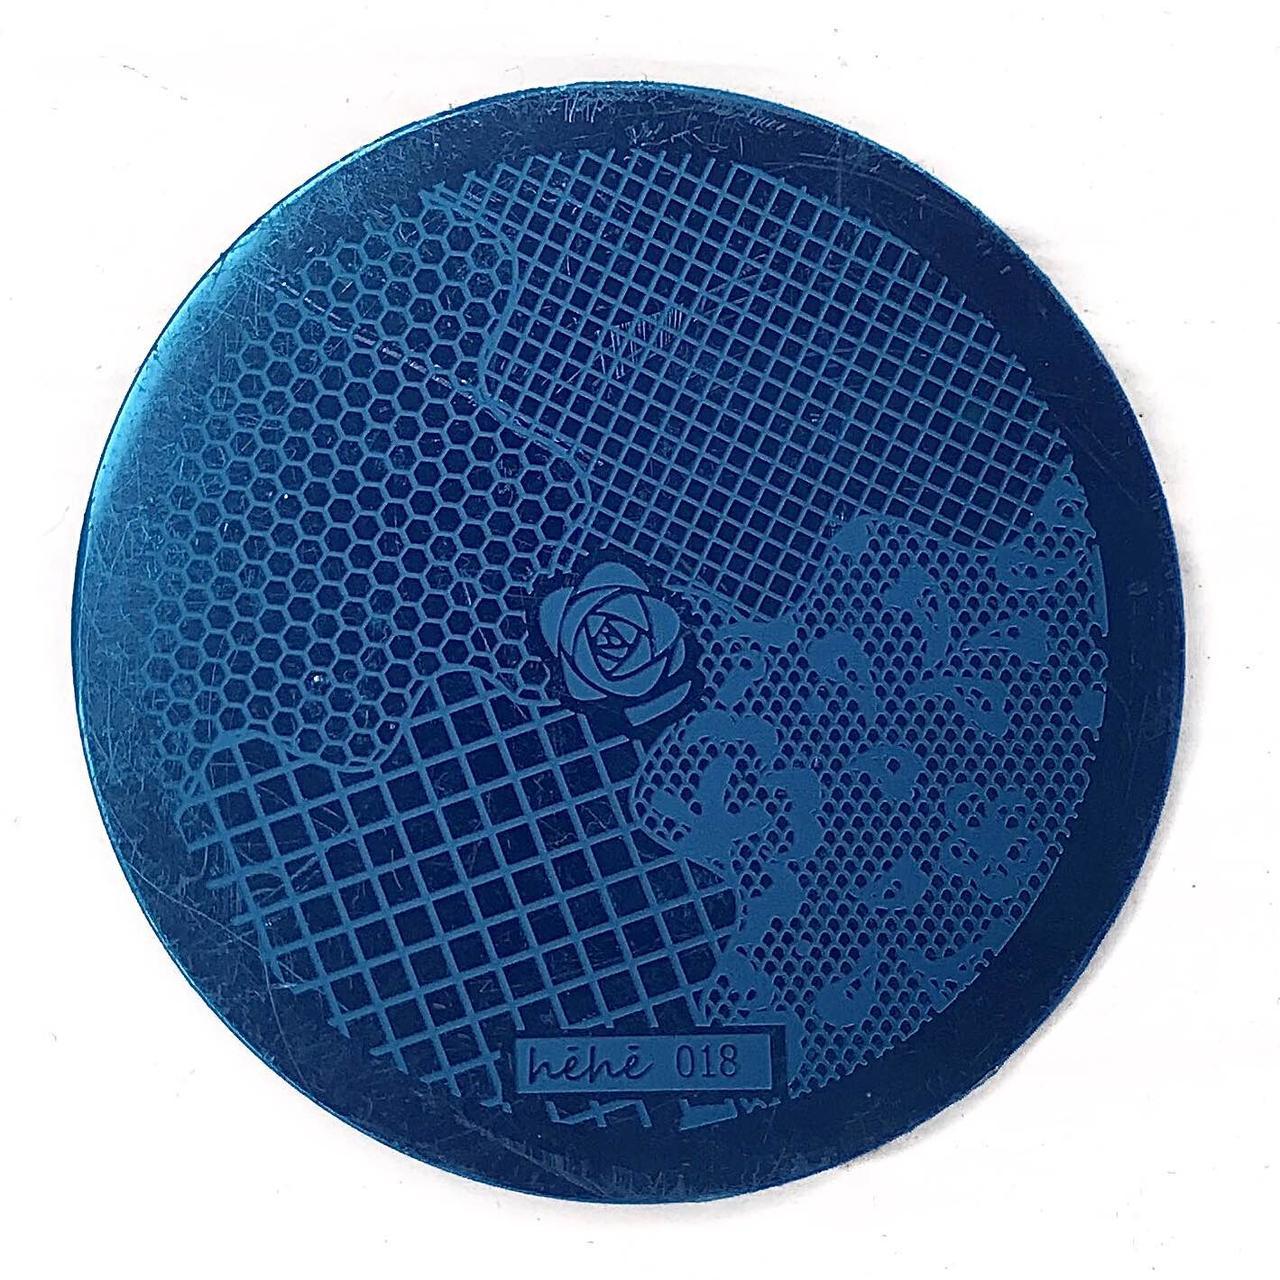 Пластина для стемпинга (круглая) hehe 018